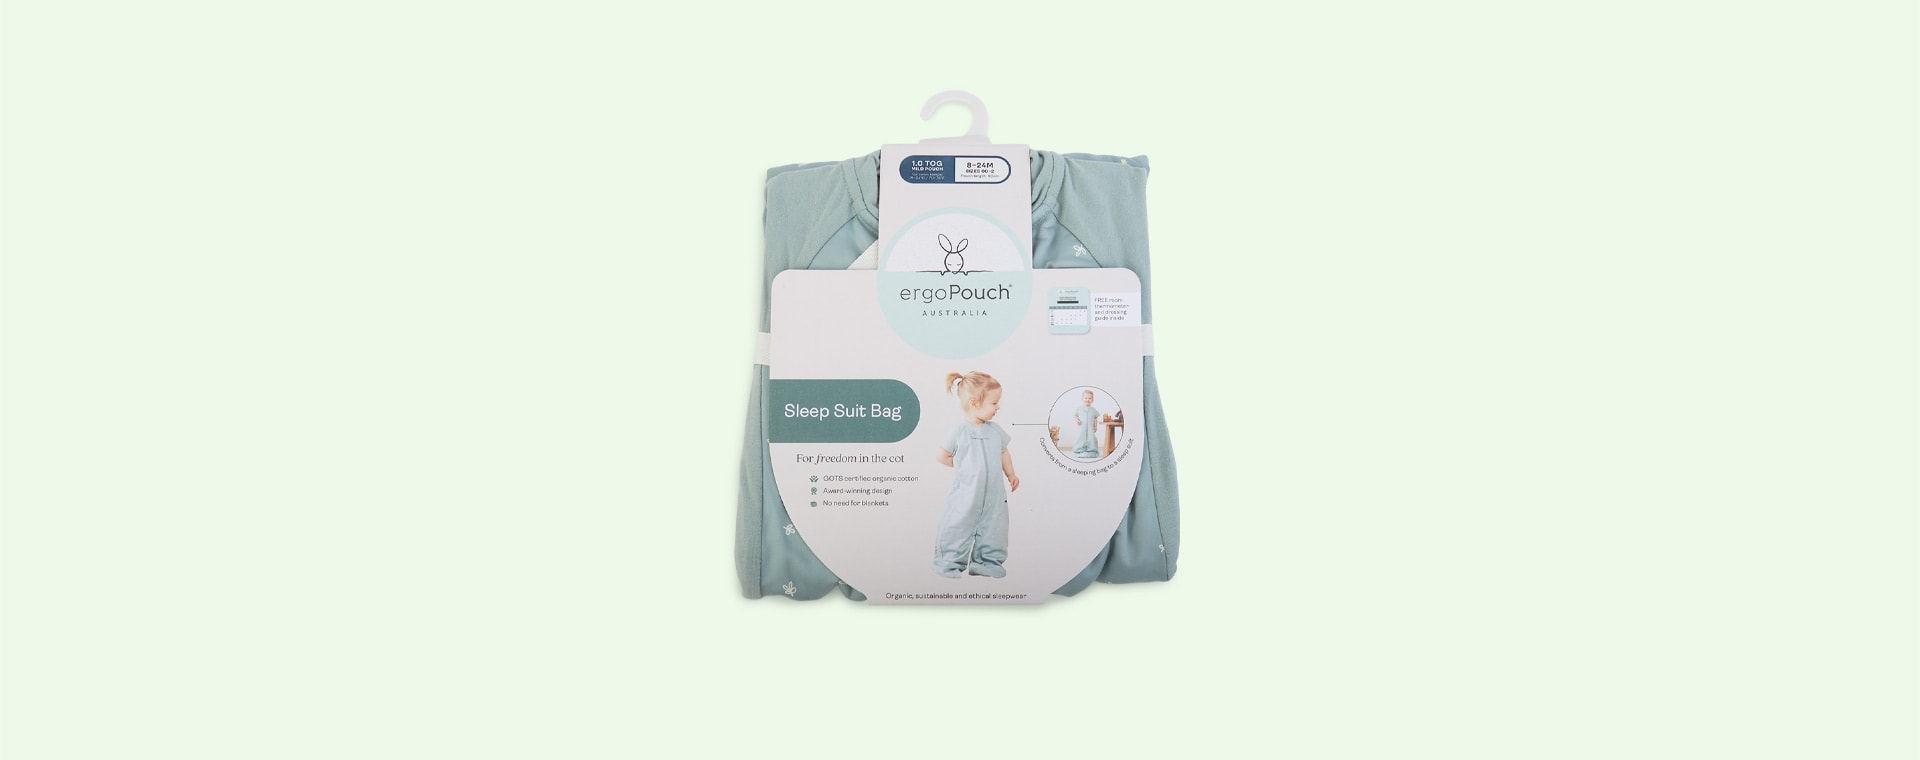 Sage Ergopouch Sleep Suit Bag 1 TOG